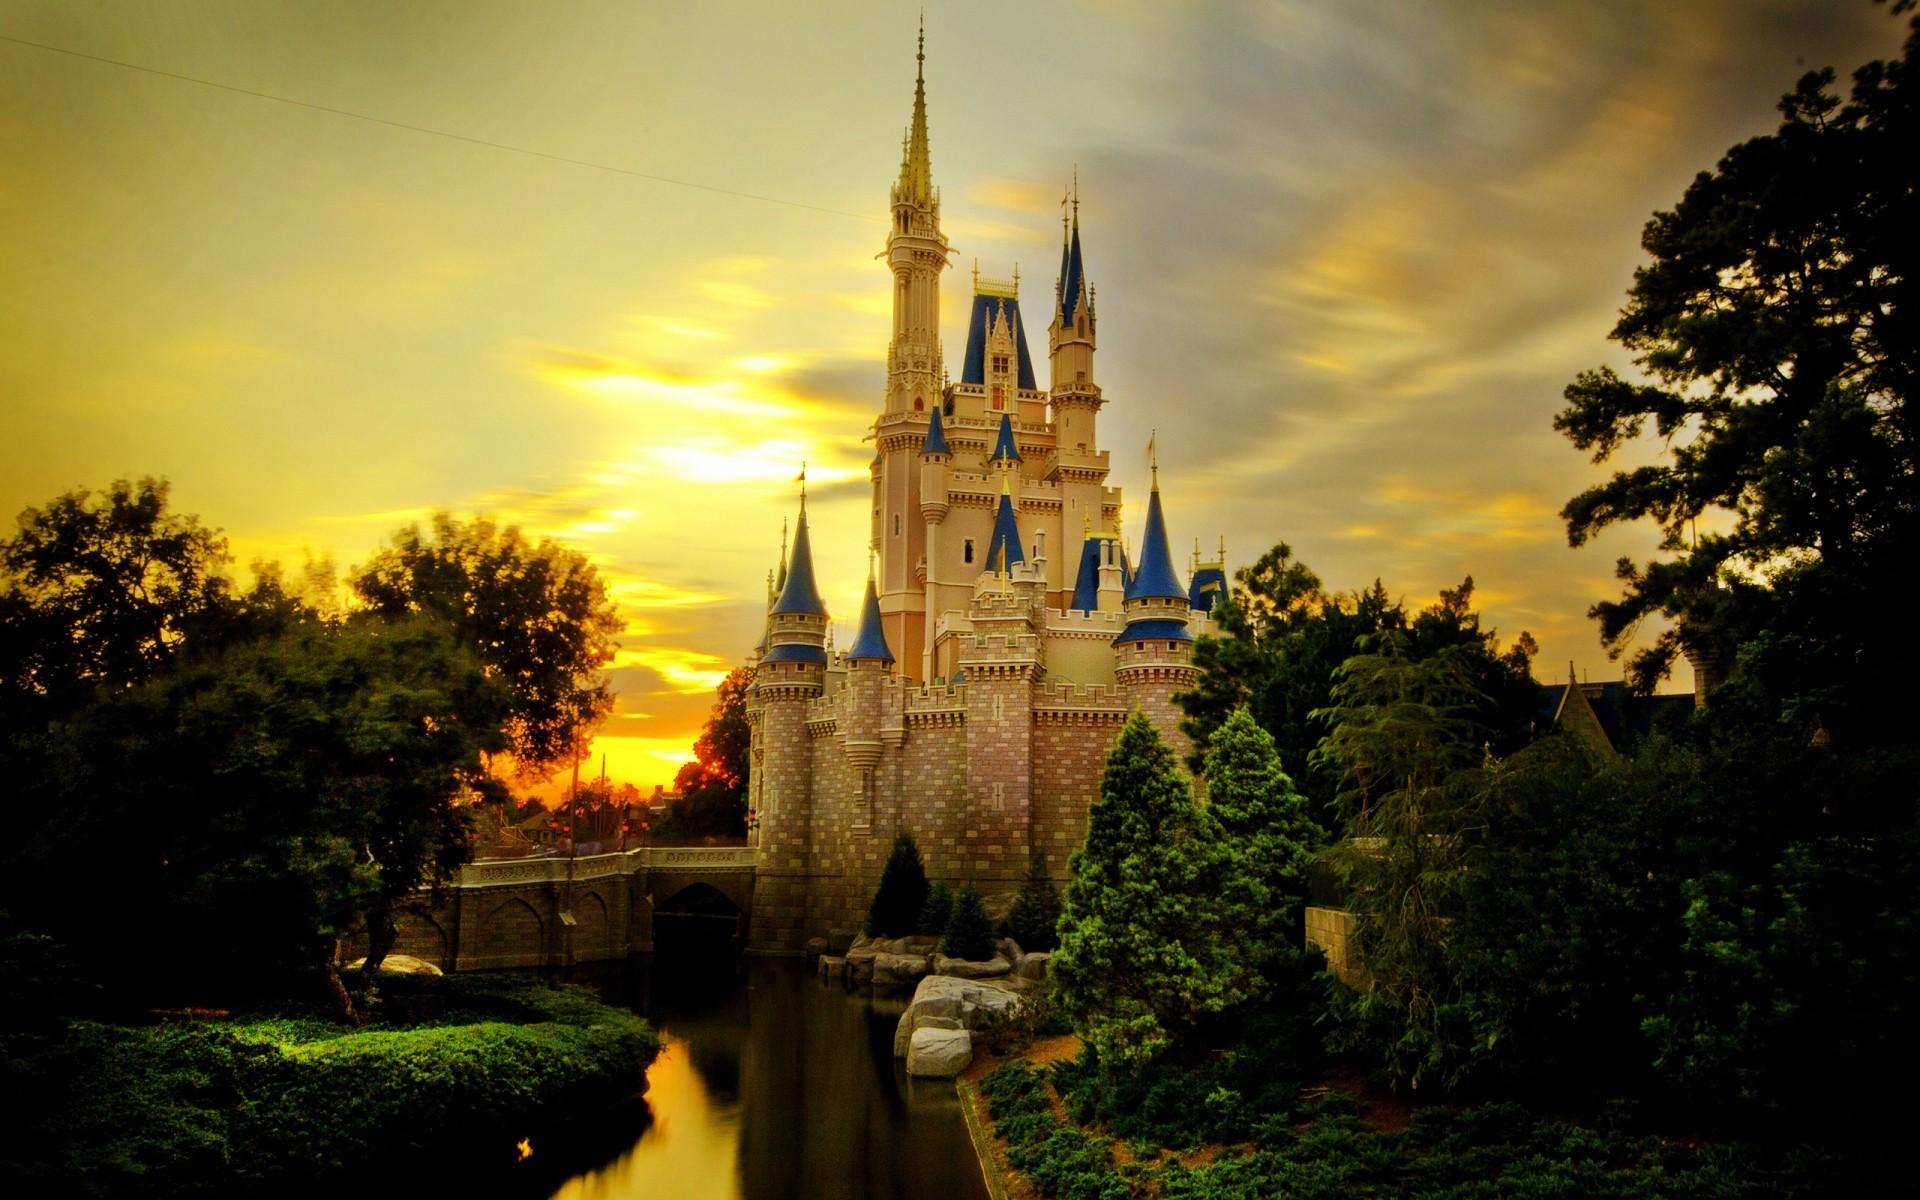 Cinderella Castle Desktop Wallpapers For Free